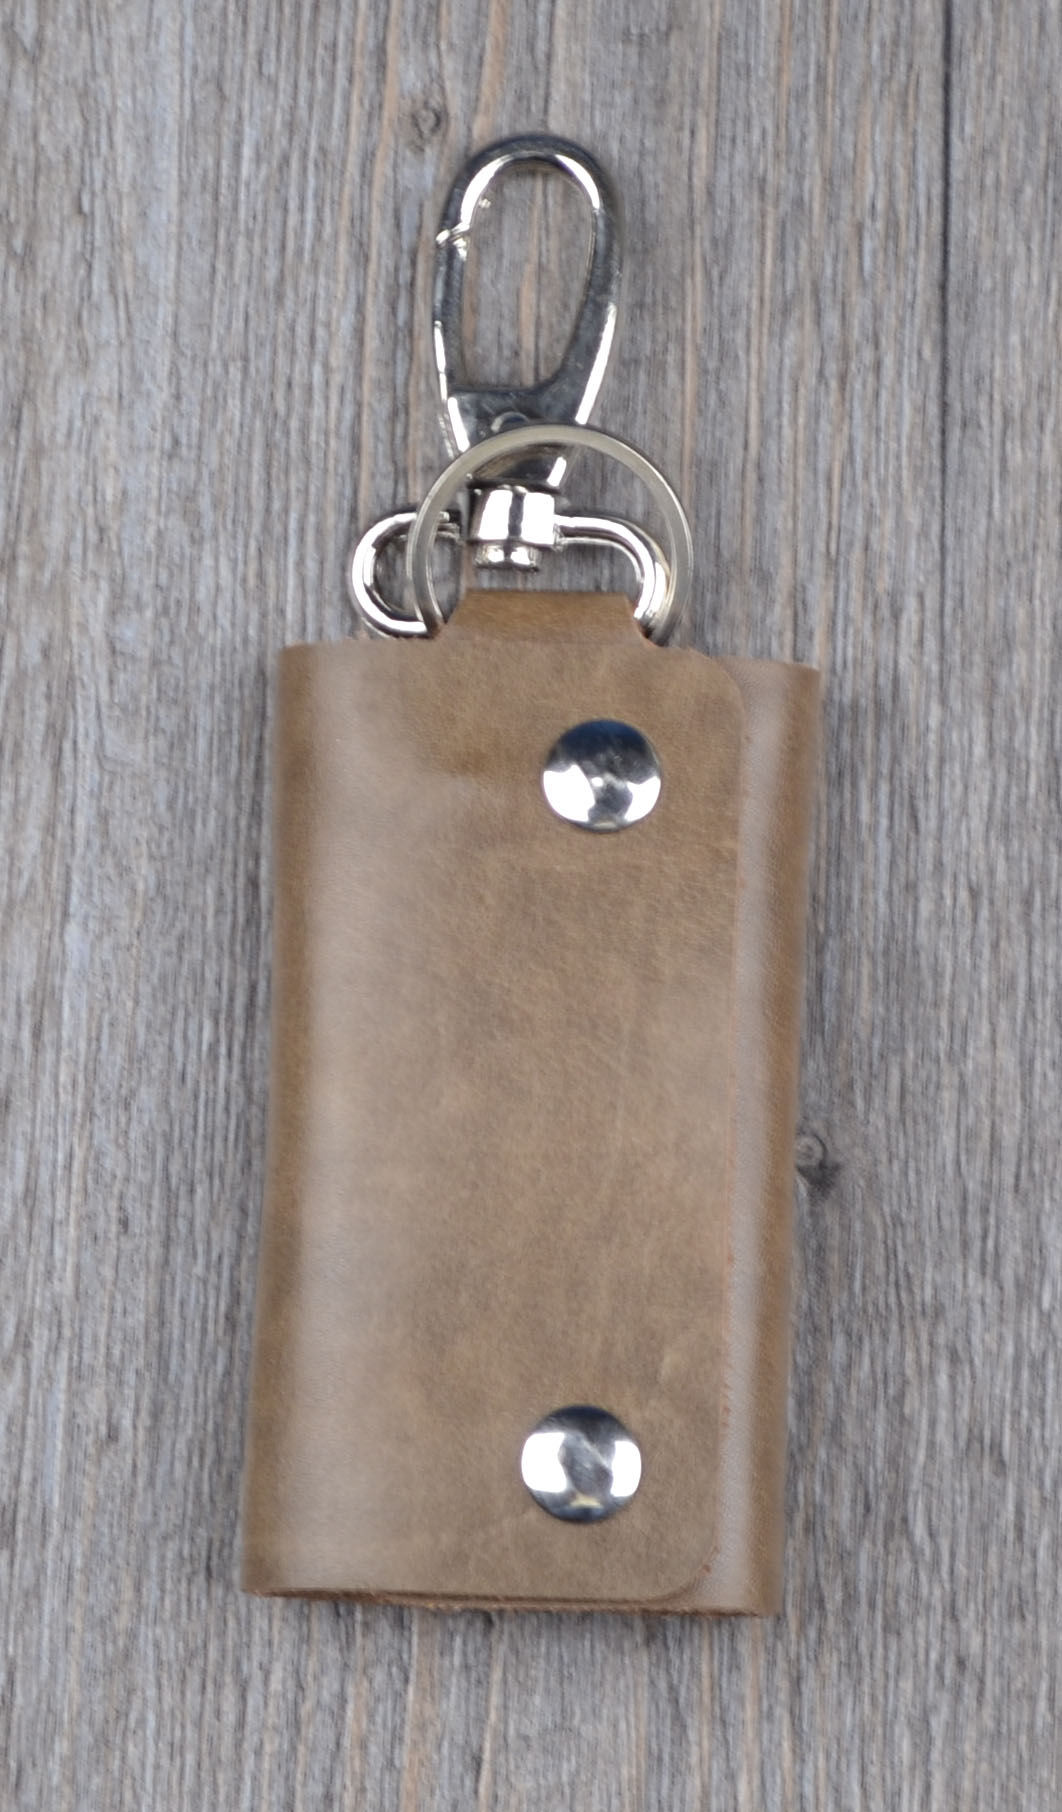 d08afd465 London Knicker Vintage Handmade Leather Key Holder Wallet LC124 | Super  Hero Jackets, Movies Jackets, Fashion Jackets, Motorcycle Jackets